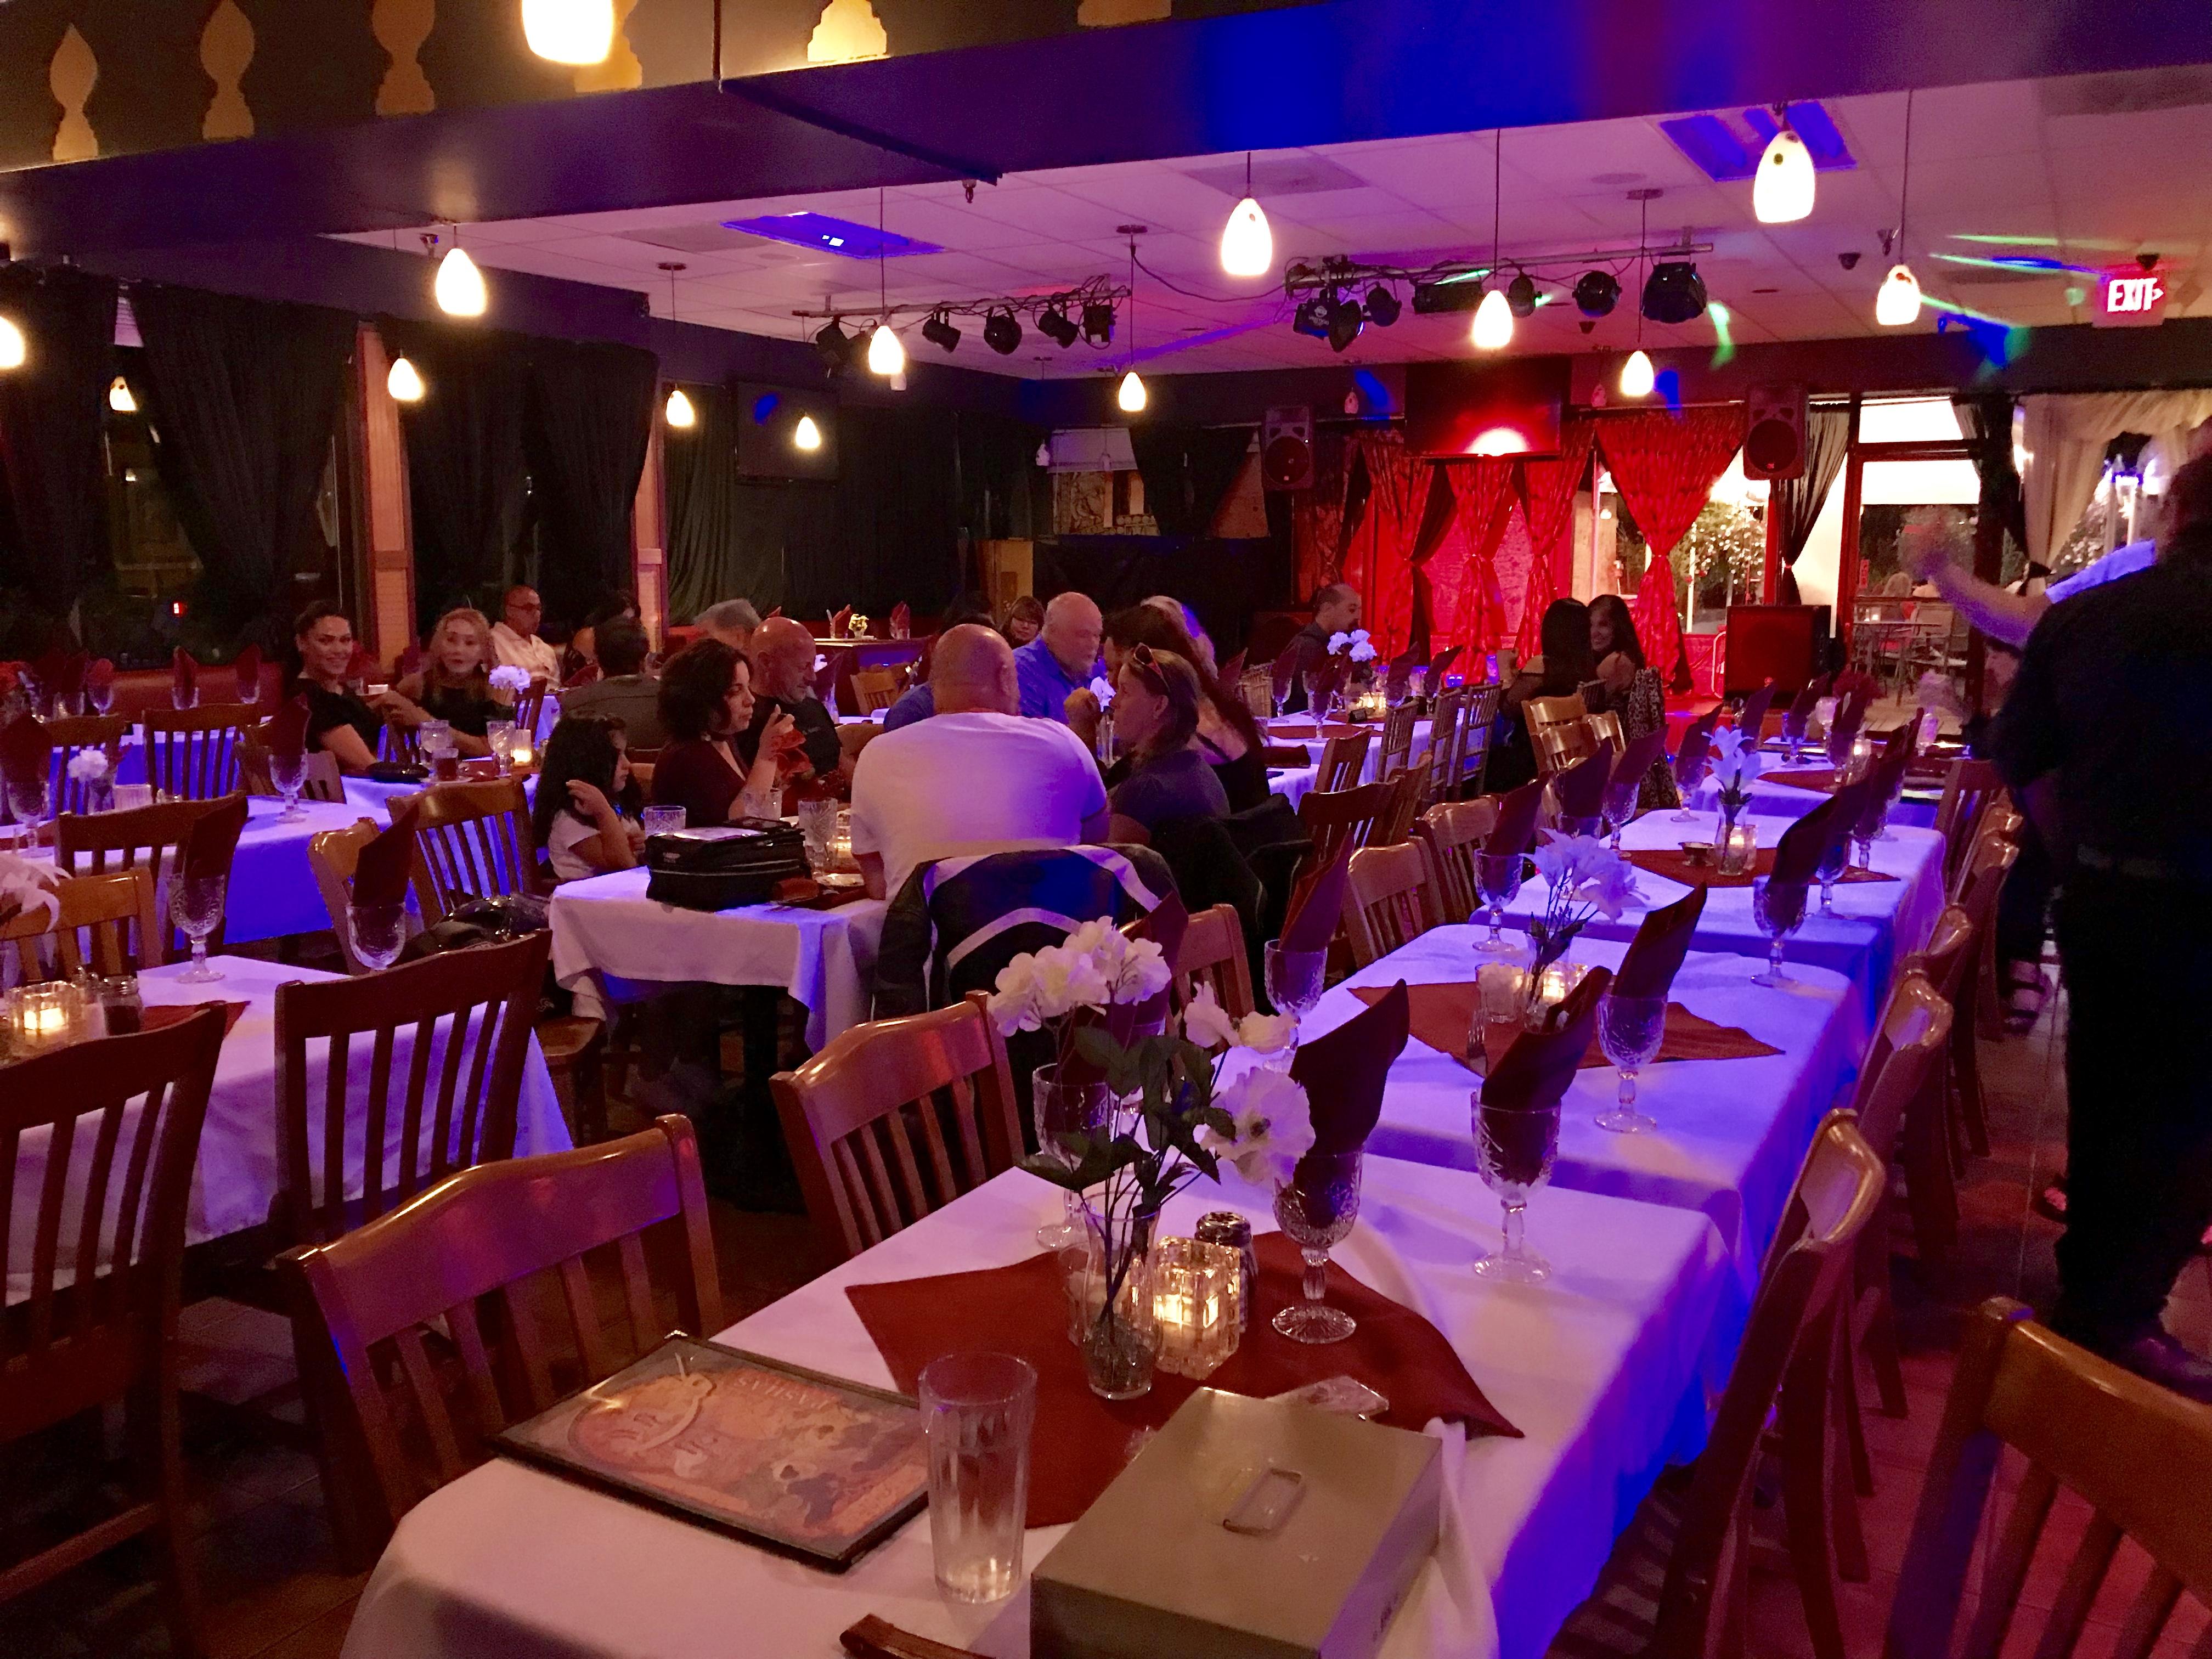 Inside Pasha Restaurant & Lounge in Oregon